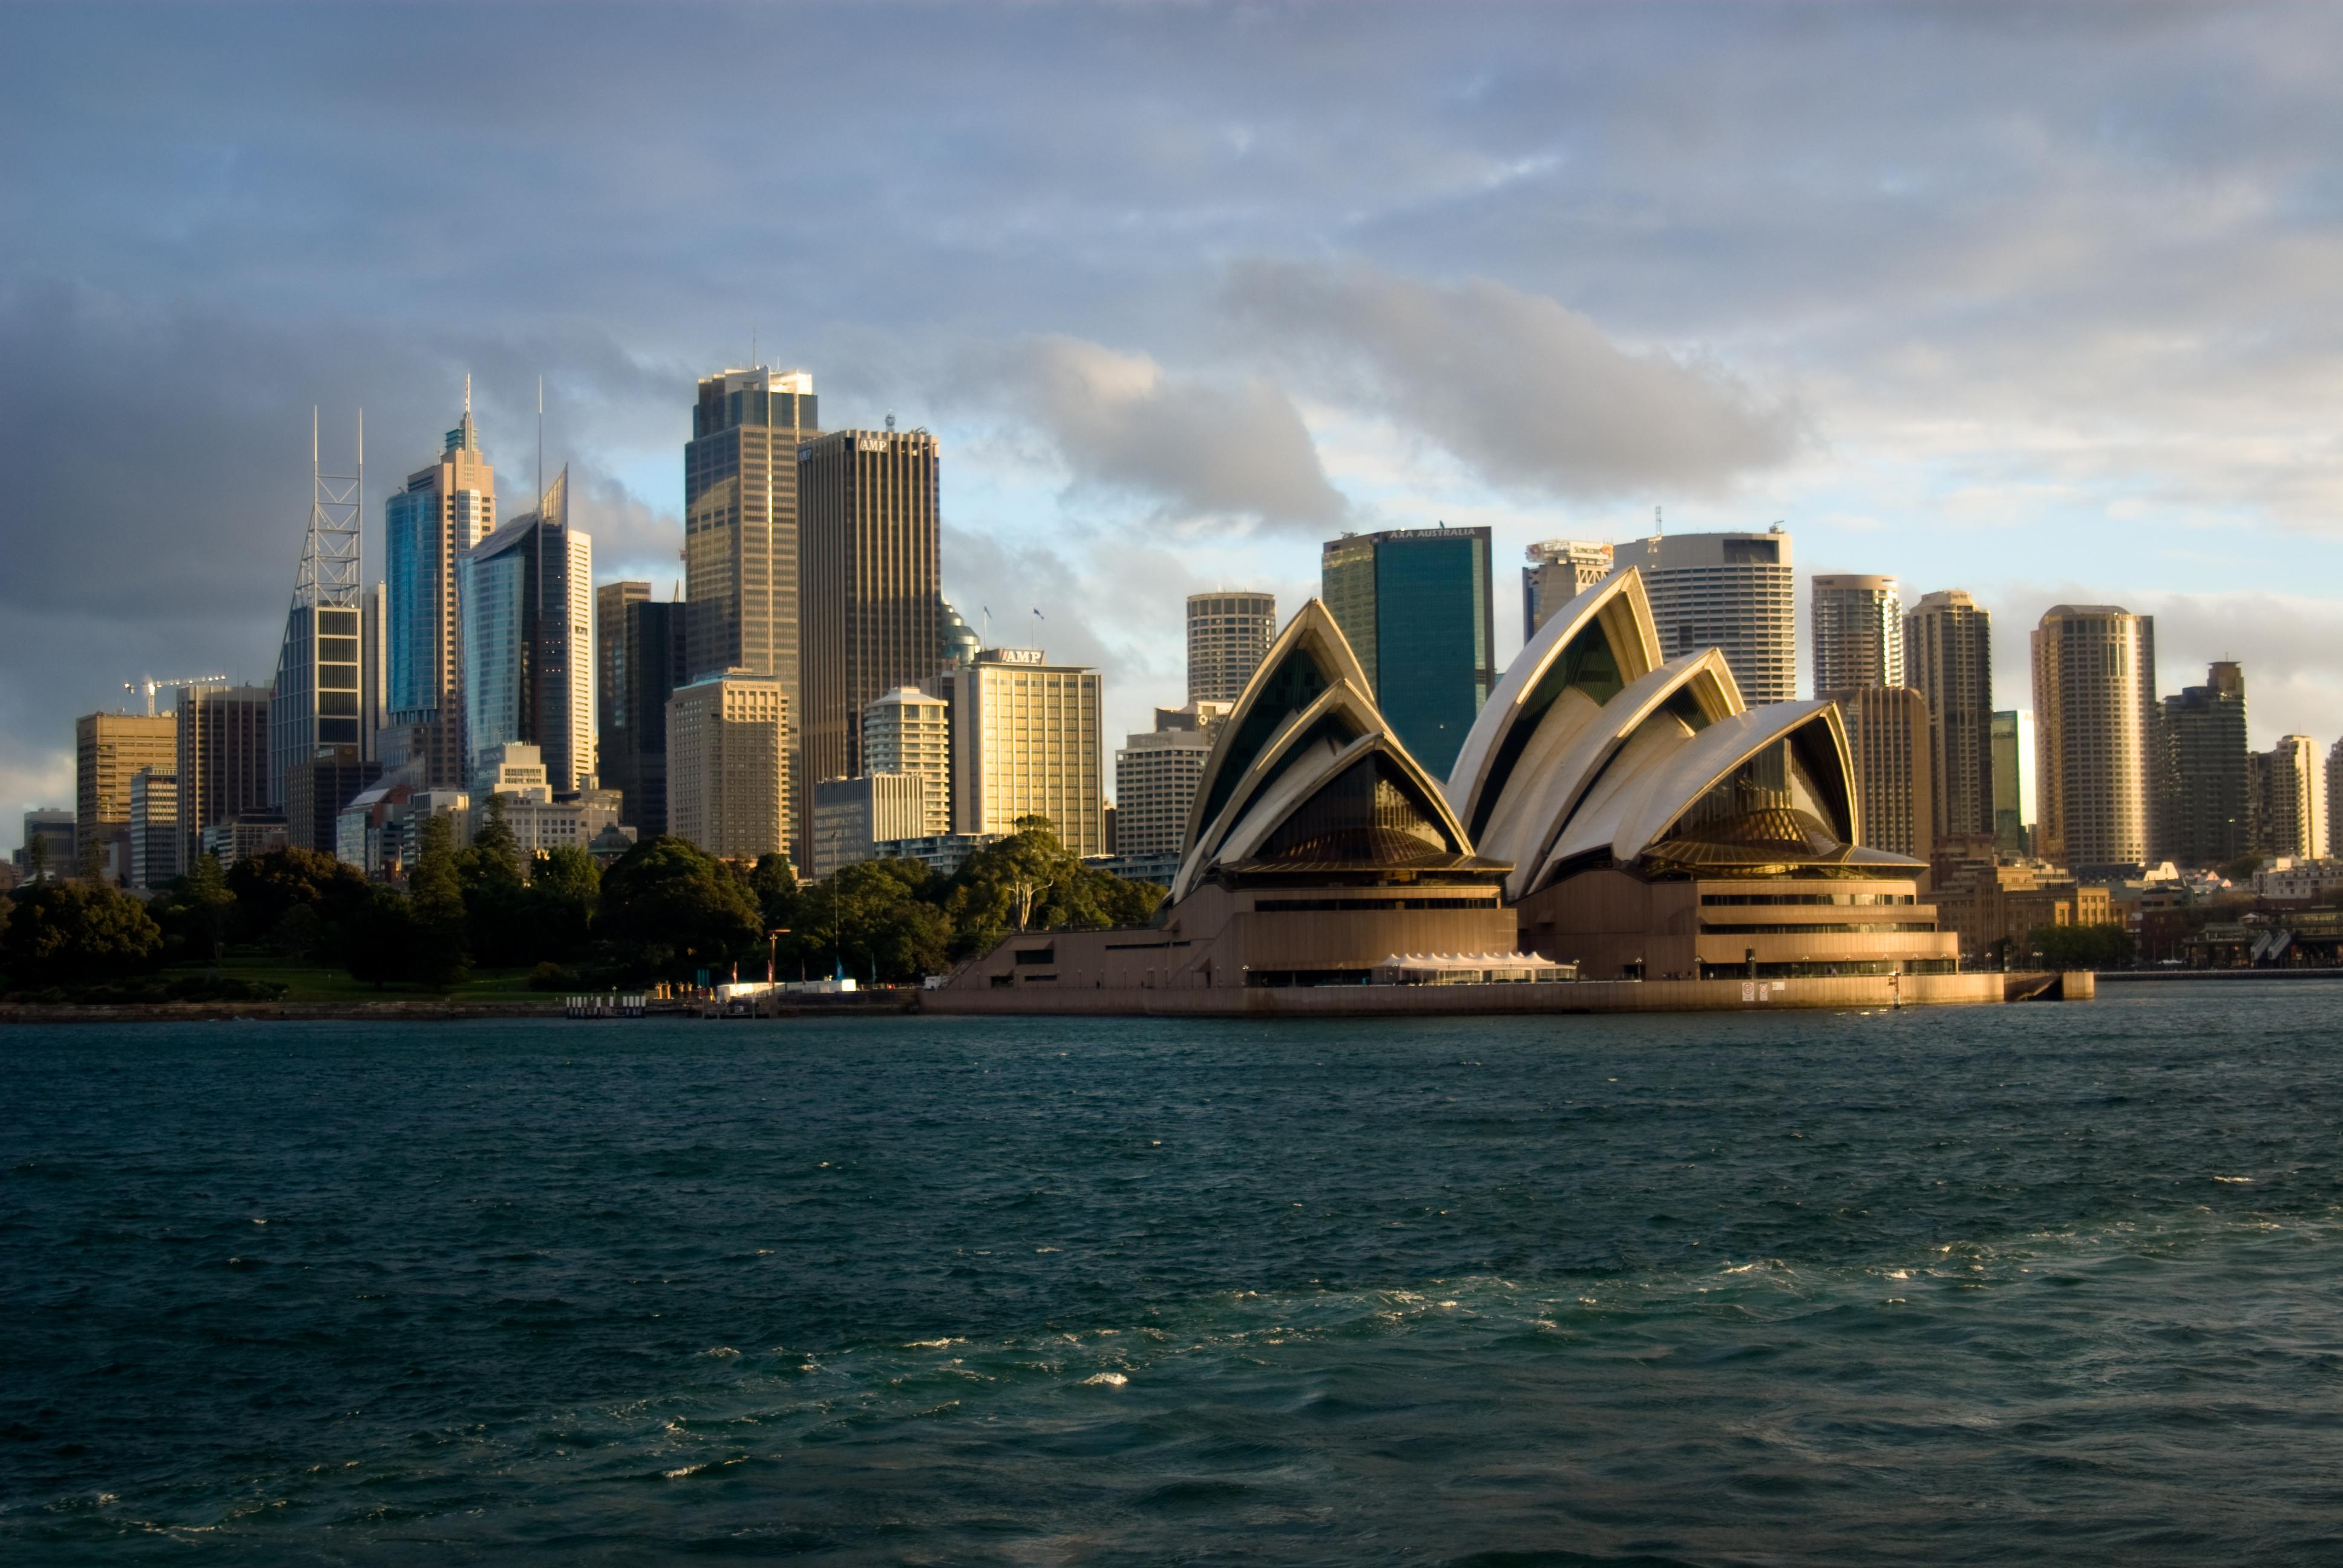 Sydney opera house wikipedia the free encyclopedia